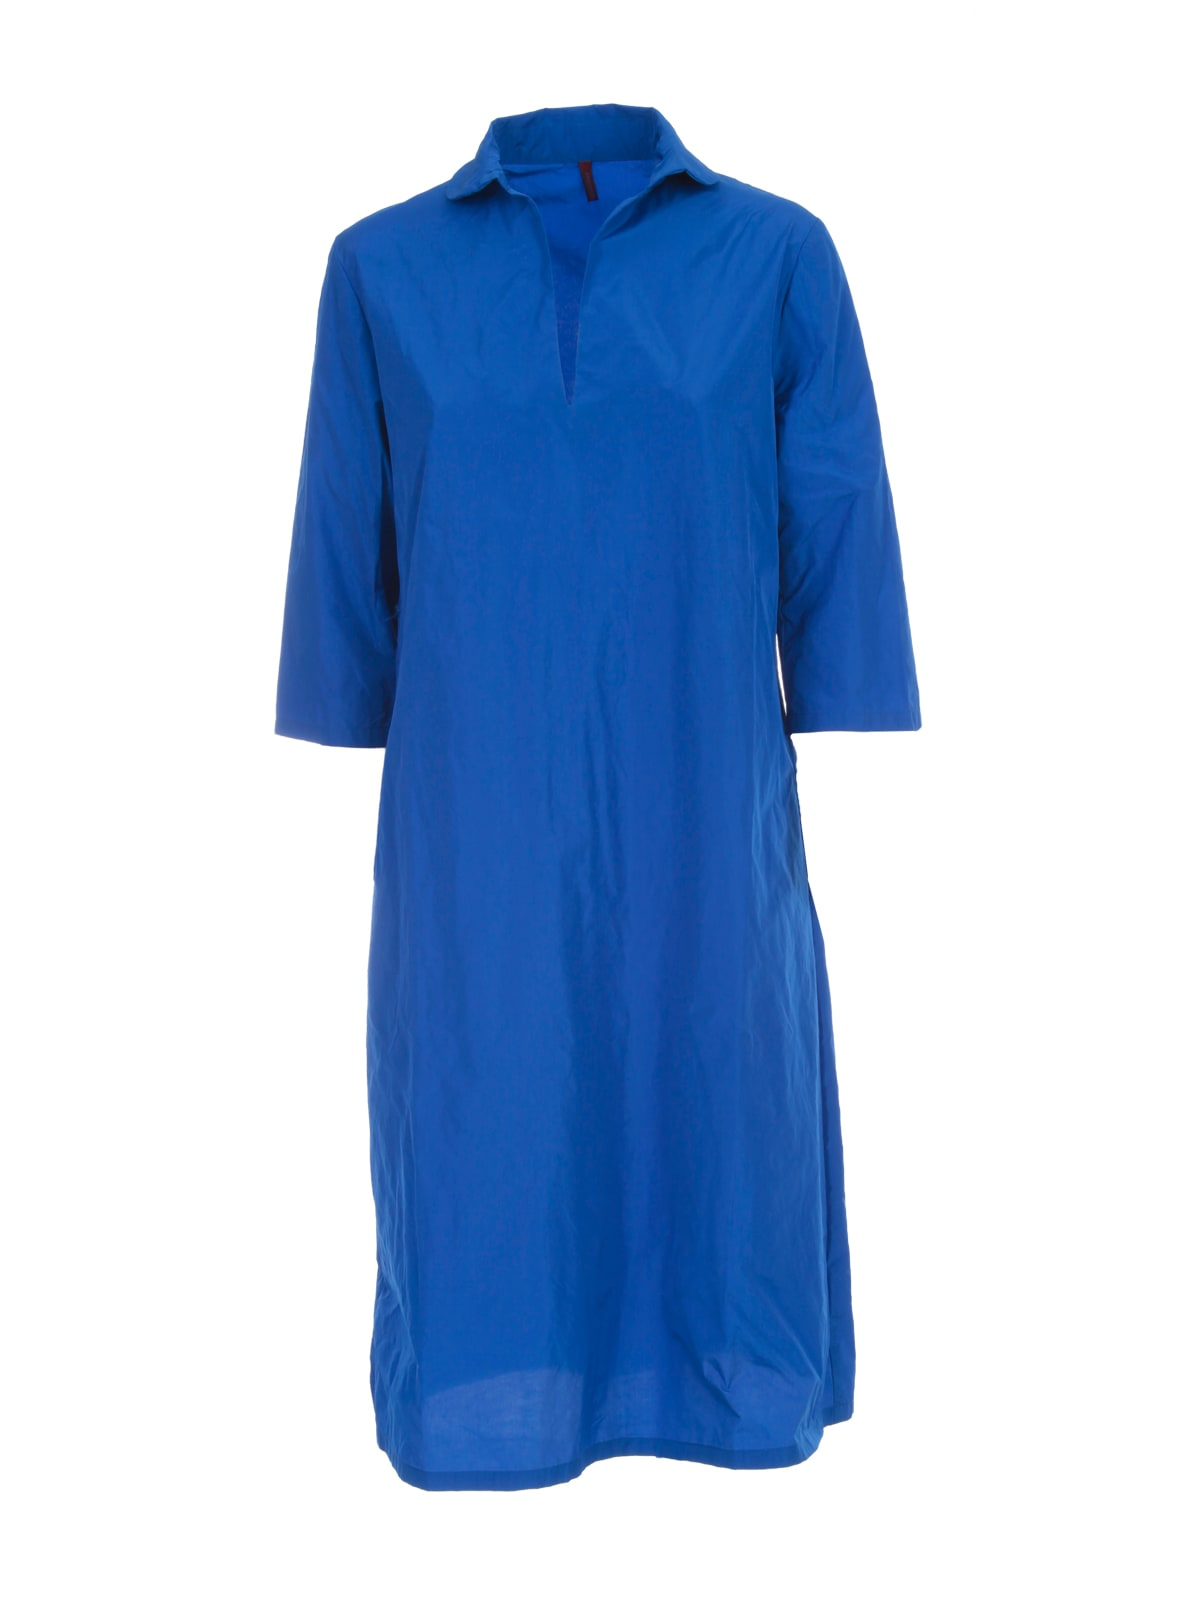 Oversized Dress 3/4s V Neck